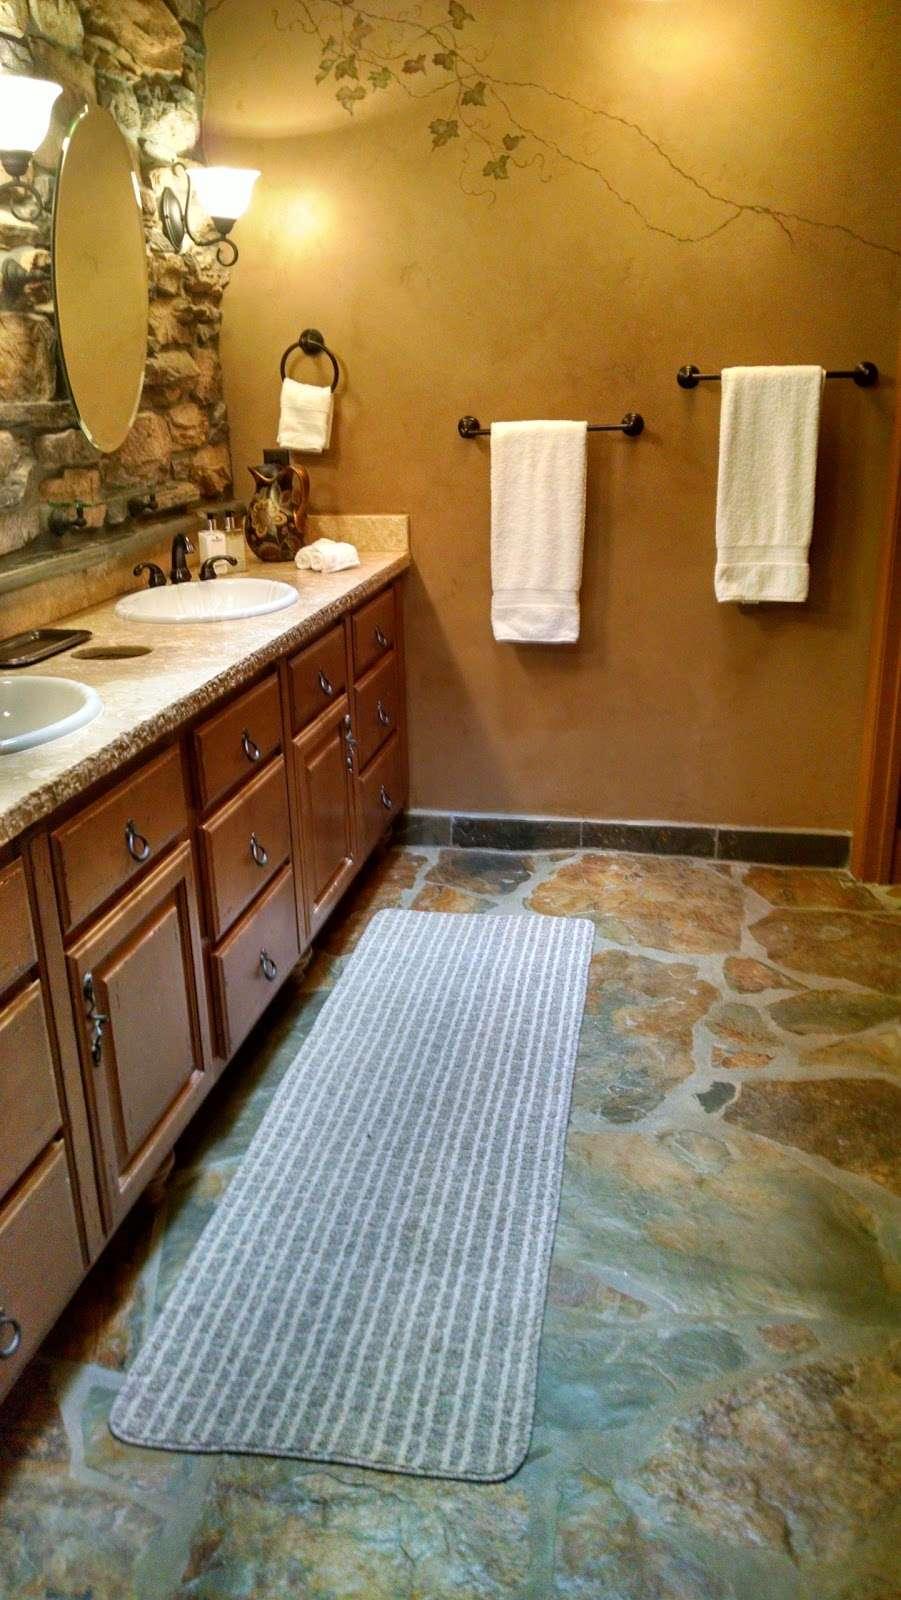 All American Team Inc - plumber  | Photo 8 of 10 | Address: ***No longer at this address***, 30275, Vía Val Verde, Temecula, CA 92591, USA | Phone: (888) 477-2877